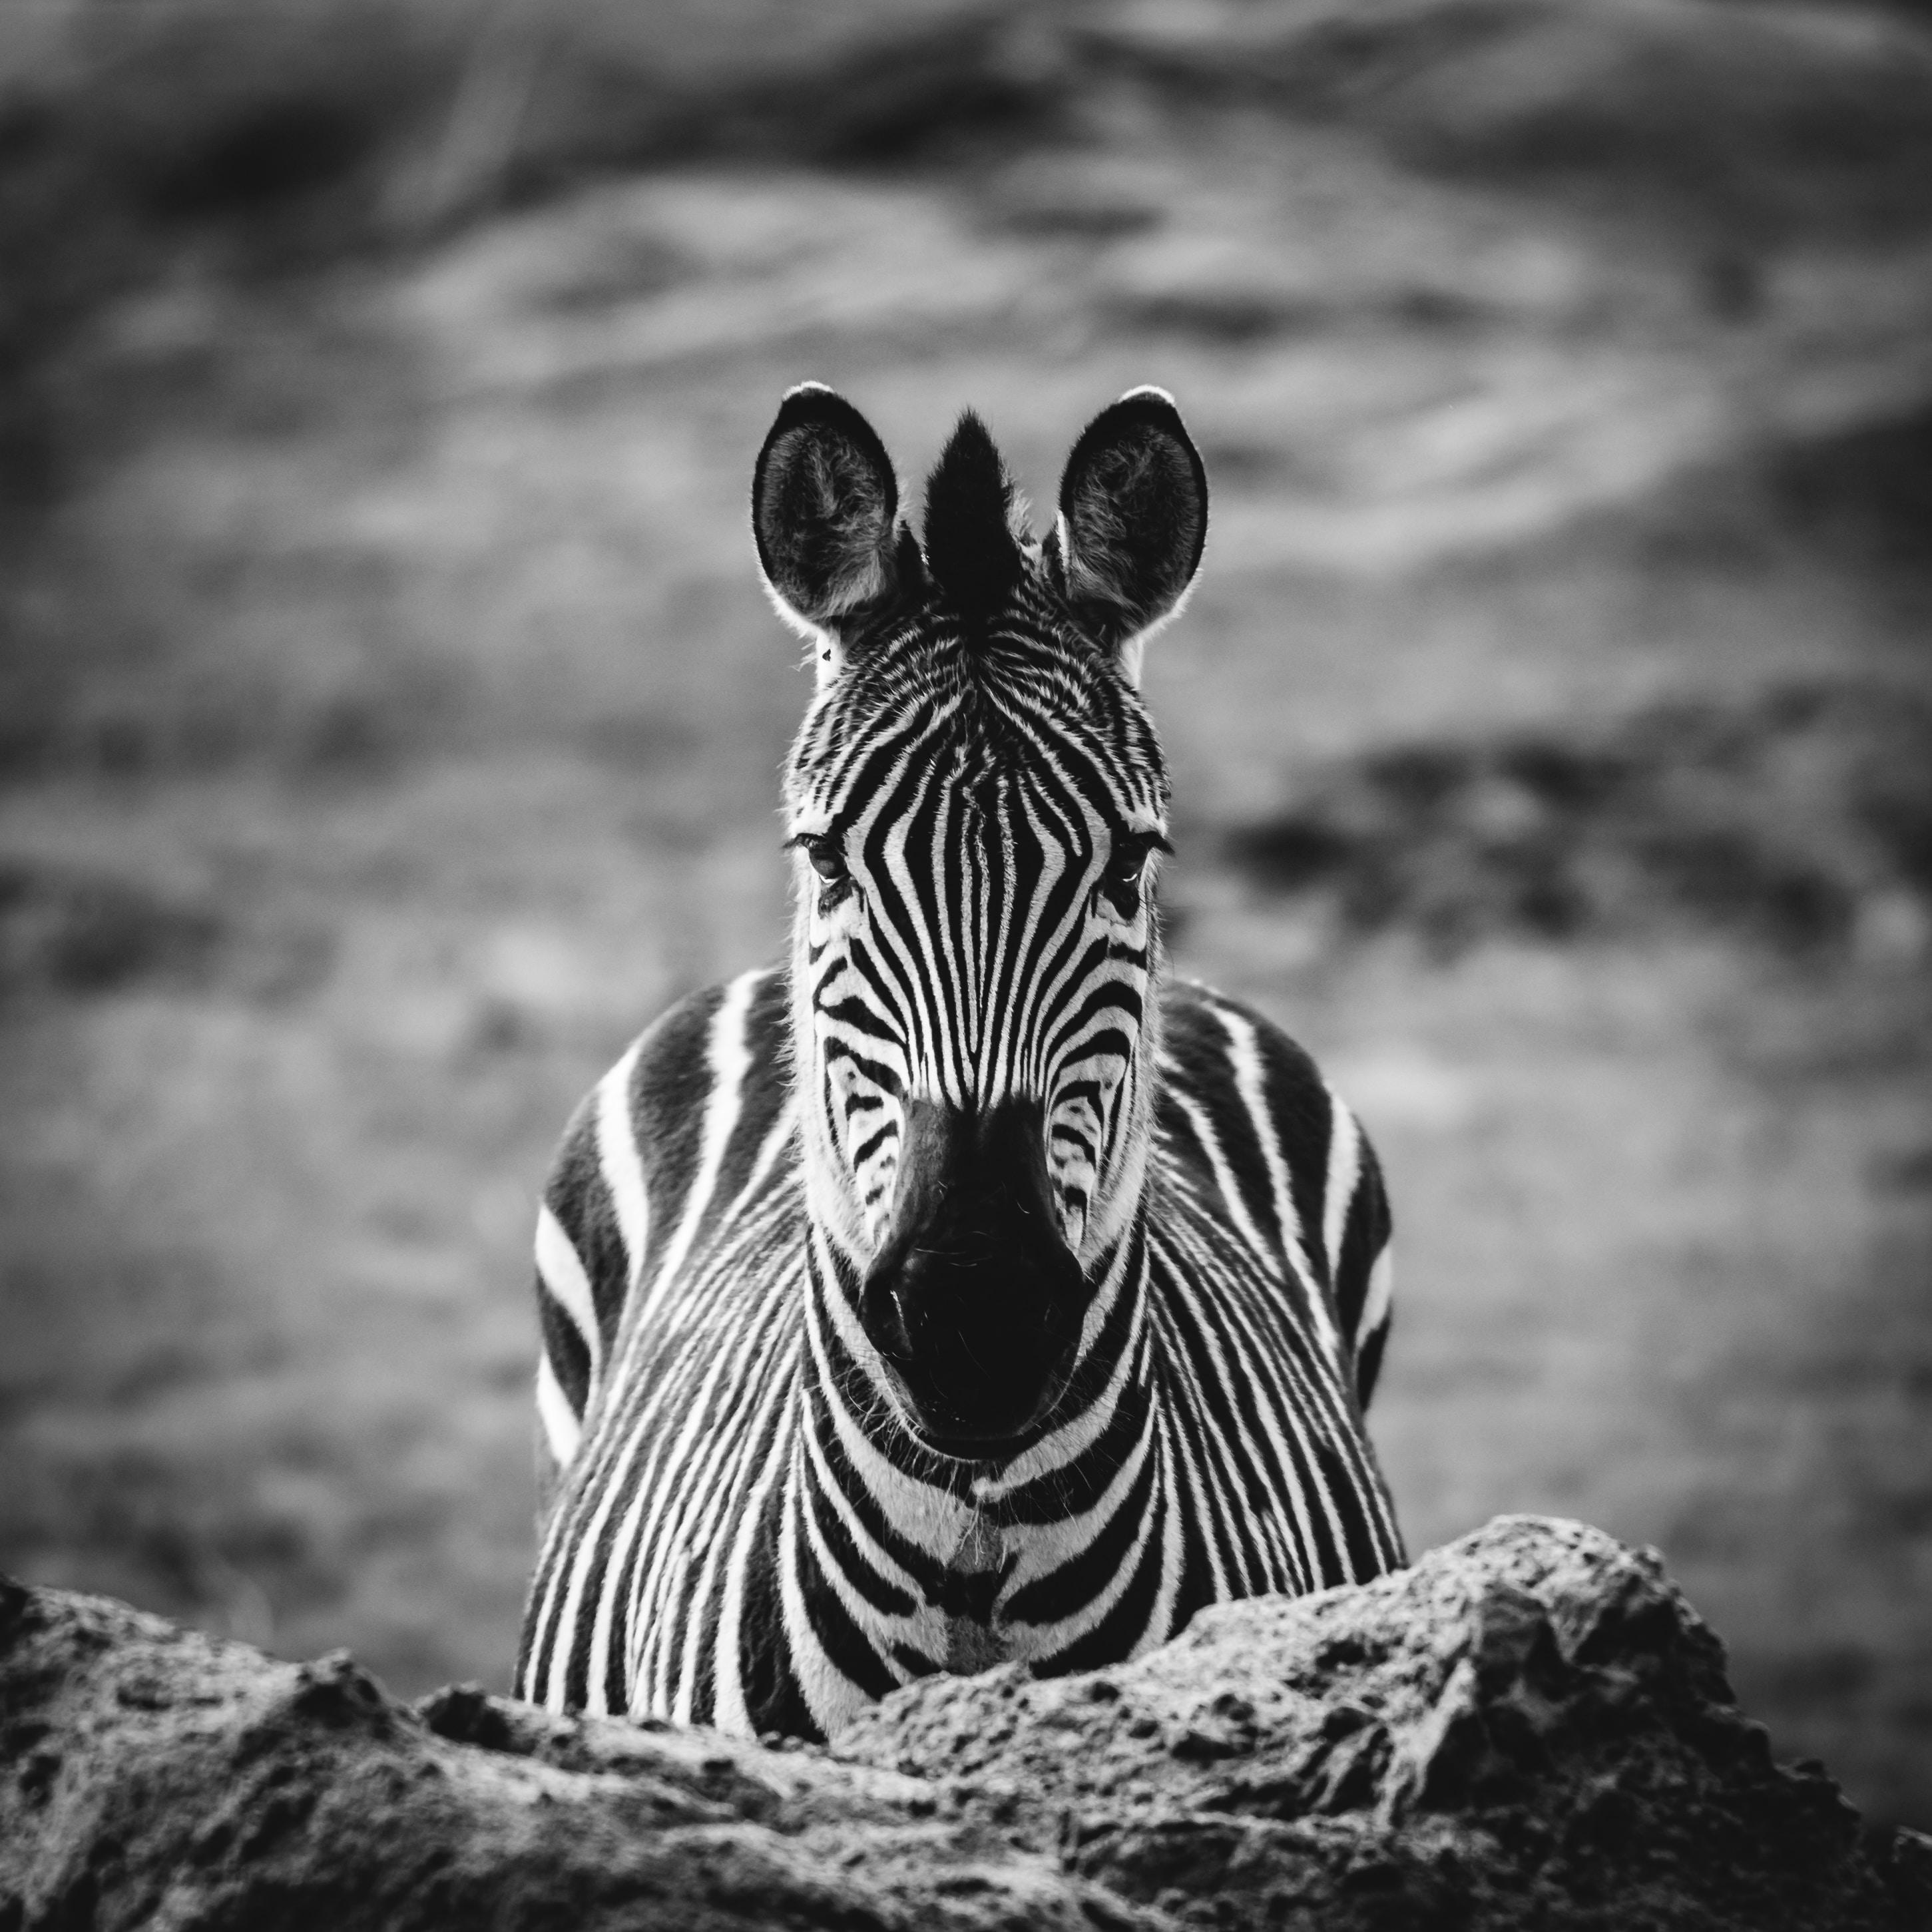 grayscale photo of zebra